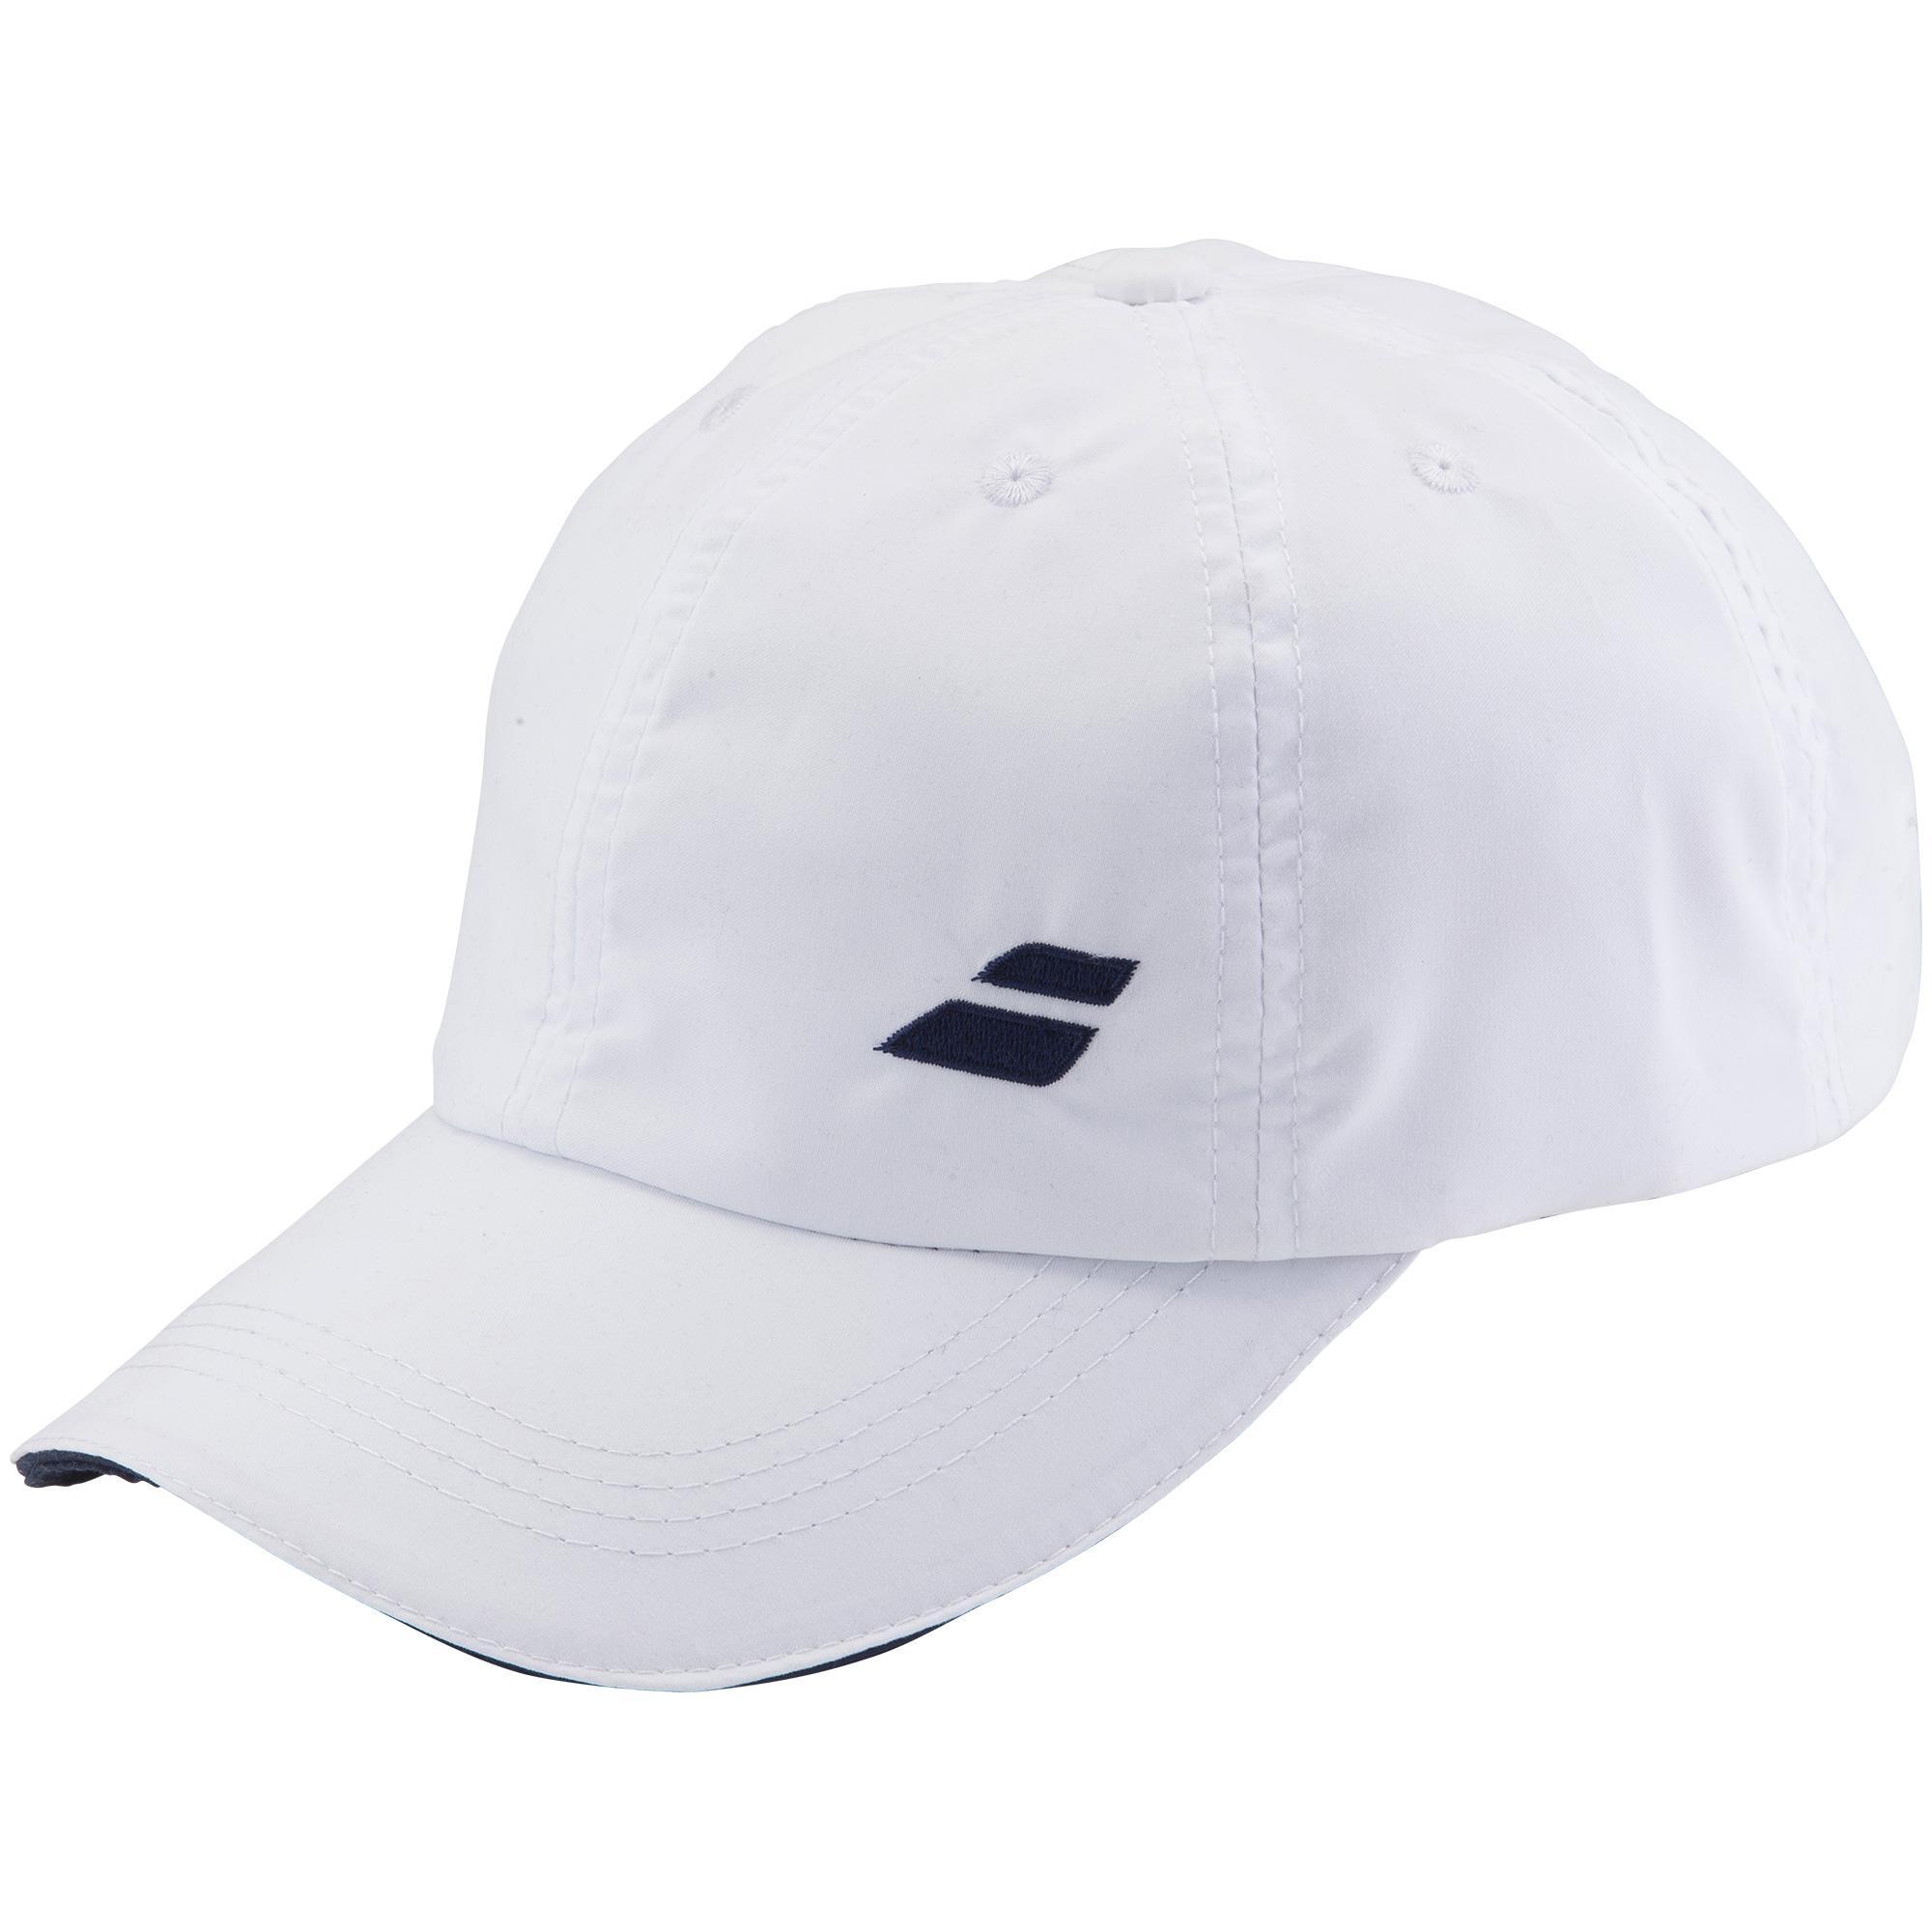 Babolat Adult Basic Logo Cap - White Navy Blue - Tennisnuts.com 041caac7907